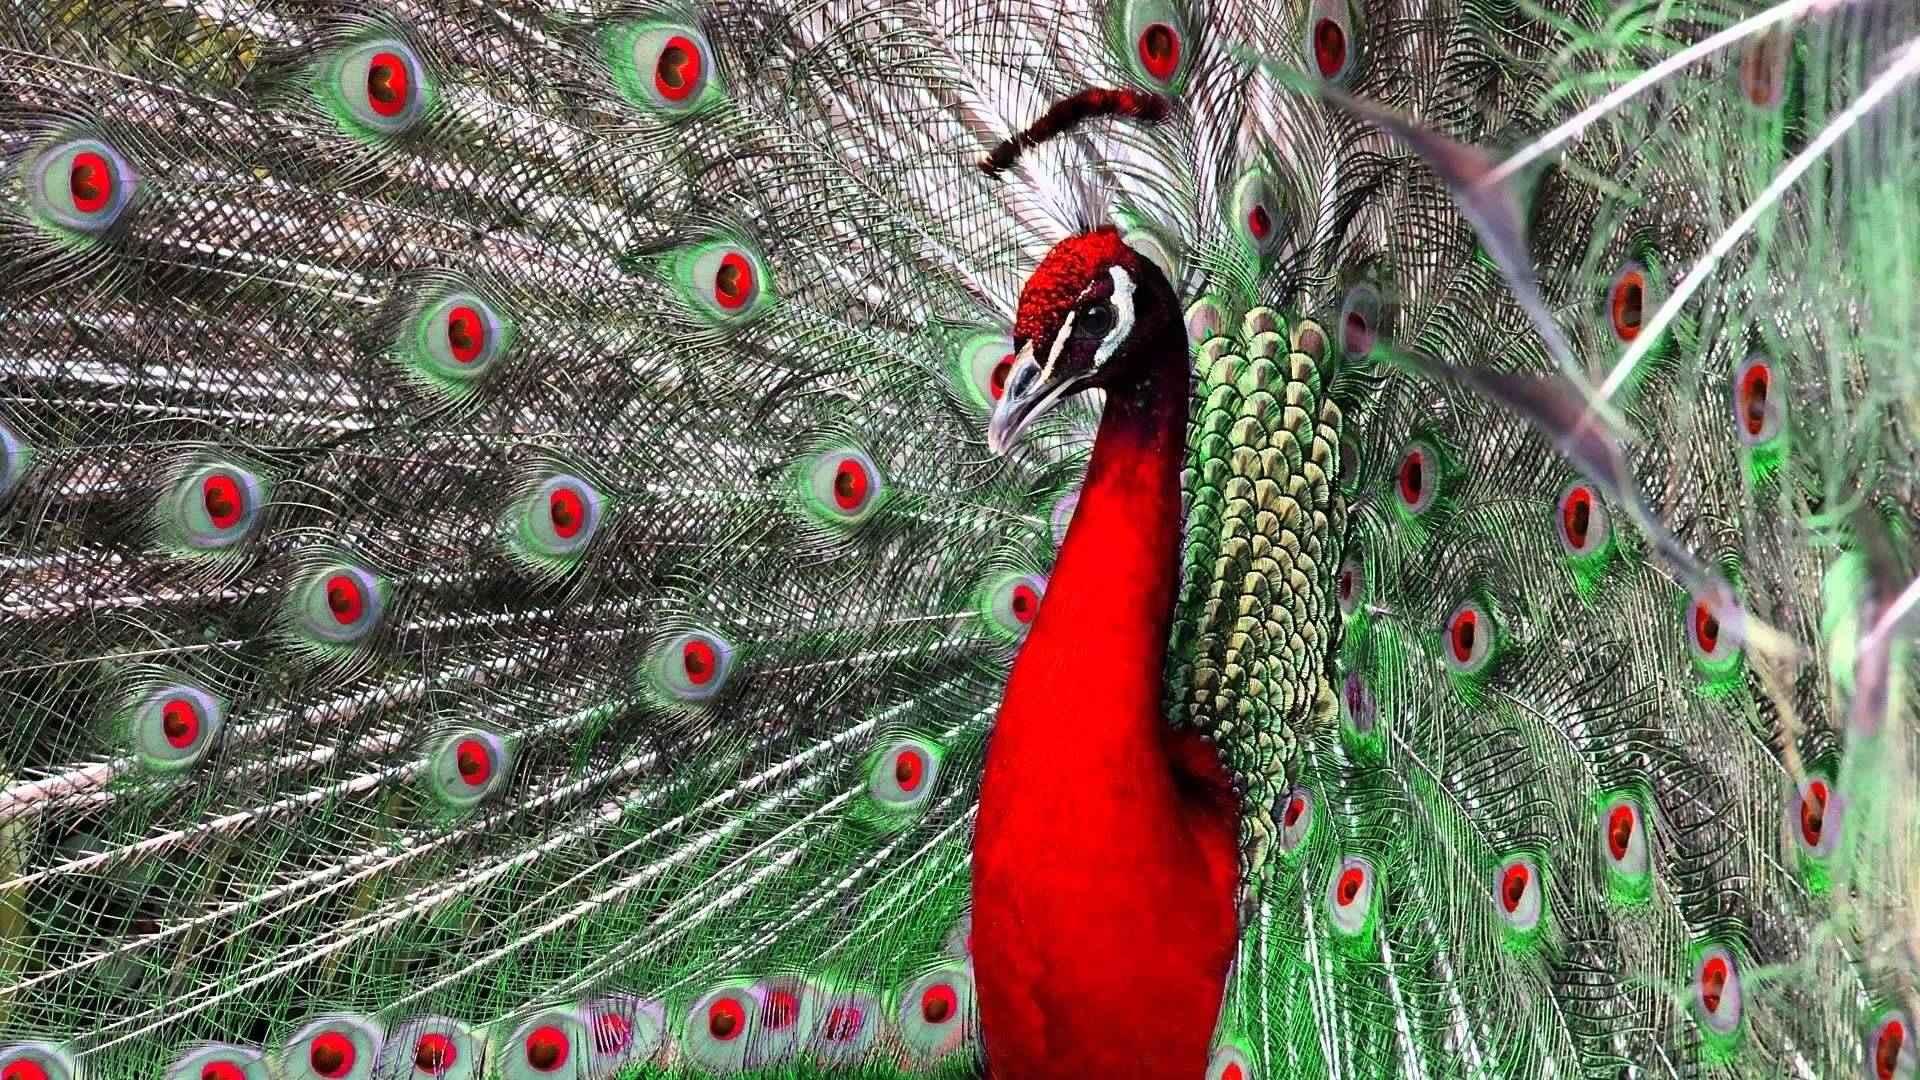 beautiful peacock images hd